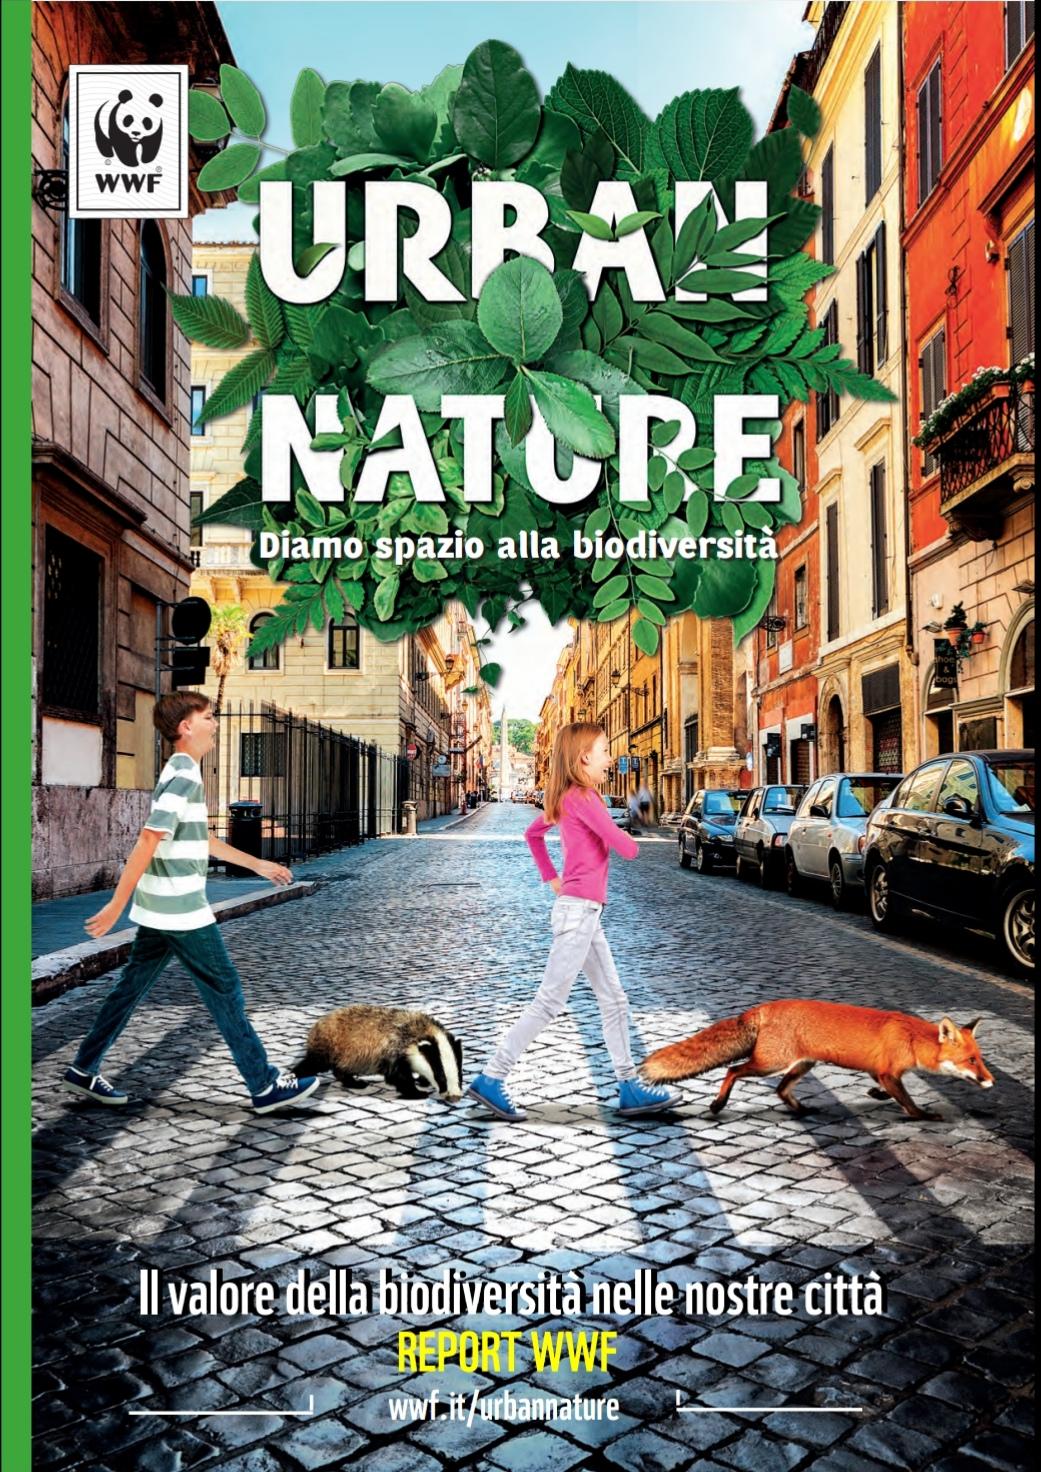 Salerno-WWF-Urban Nature